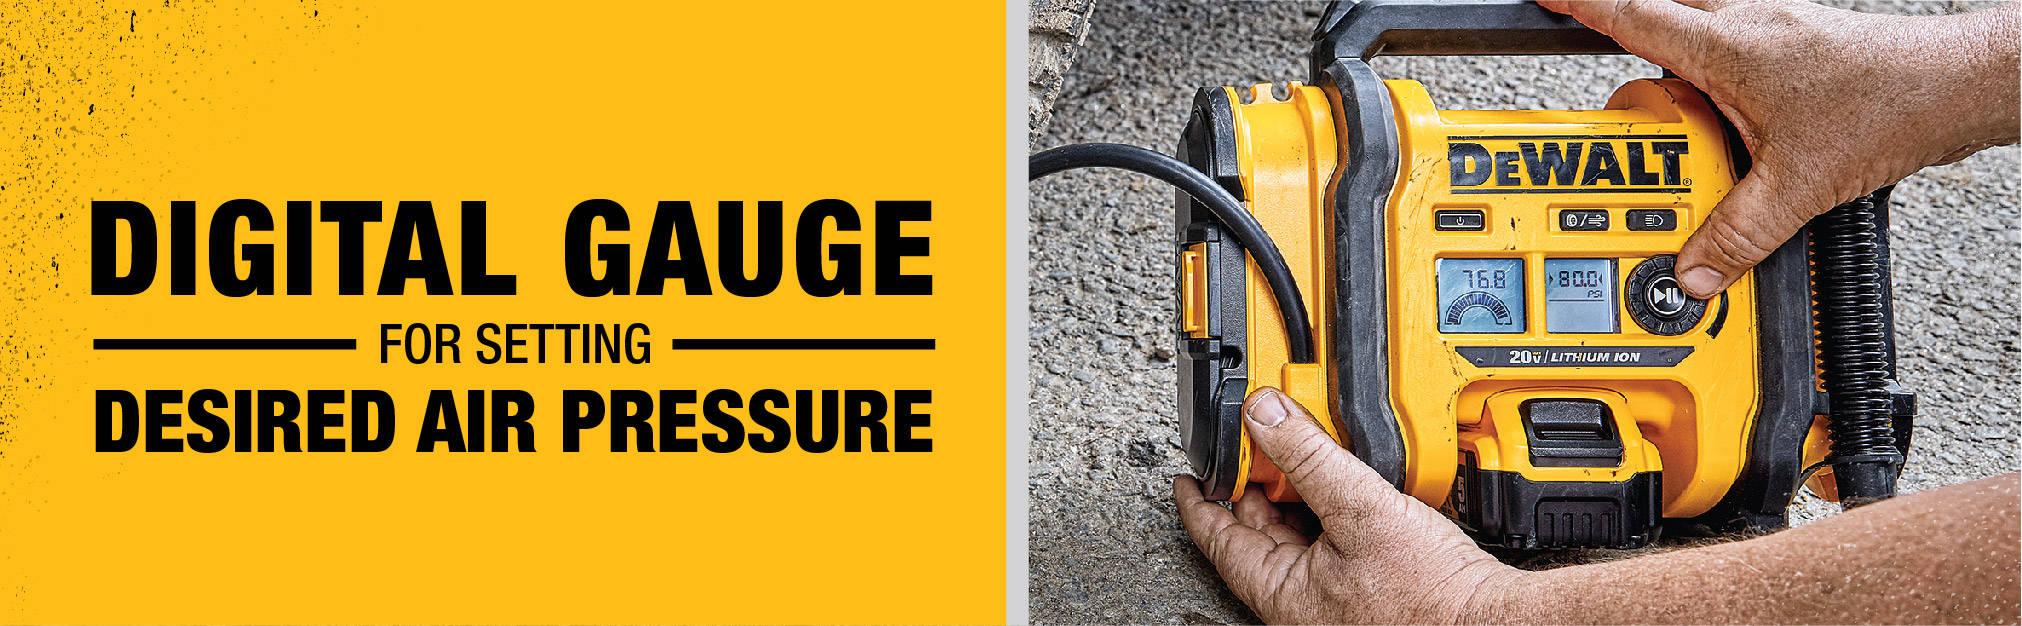 Digital Gauge for setting desired air pressure